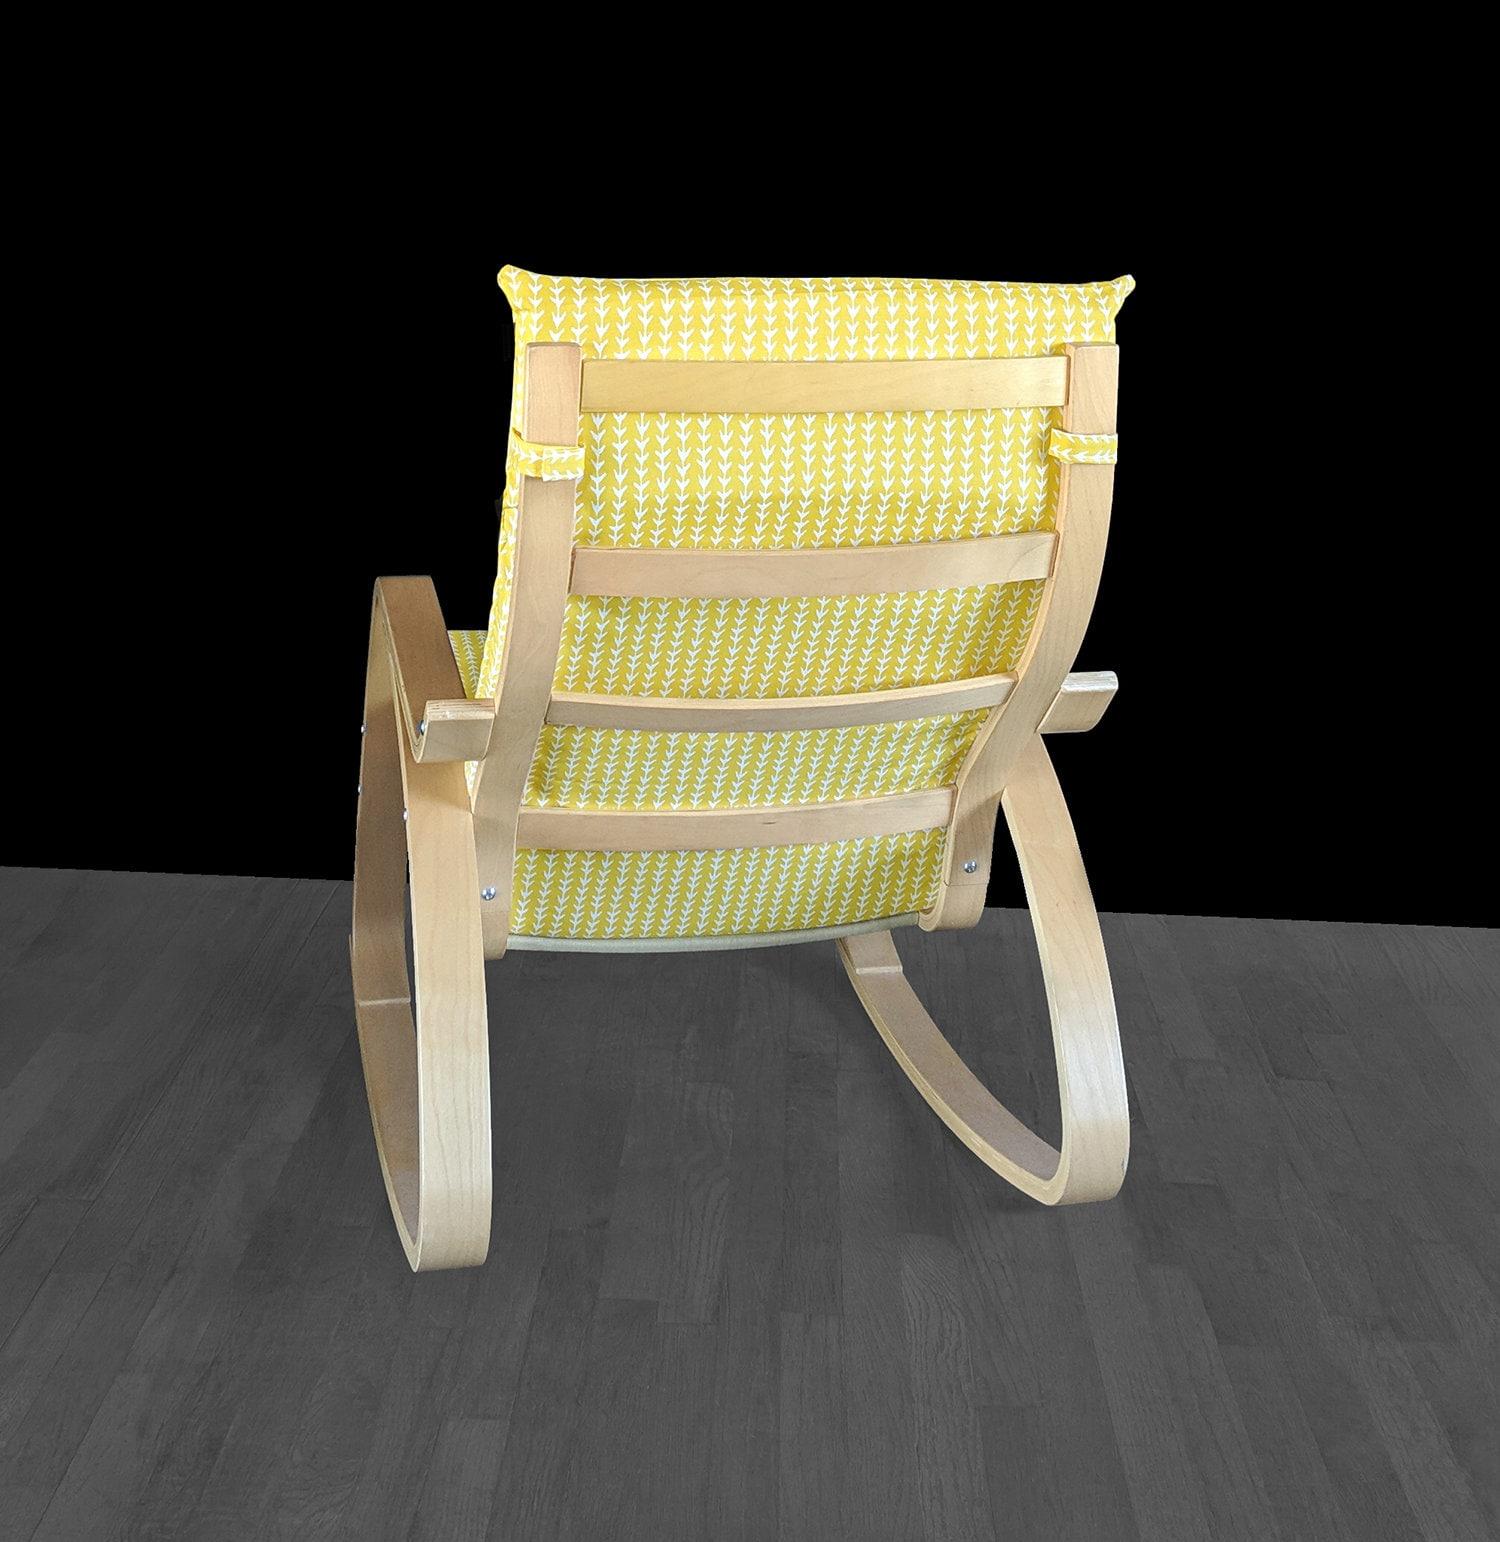 Strange Yellow Vine Bold Pattern Ikea Poang Chair Cover Evergreenethics Interior Chair Design Evergreenethicsorg